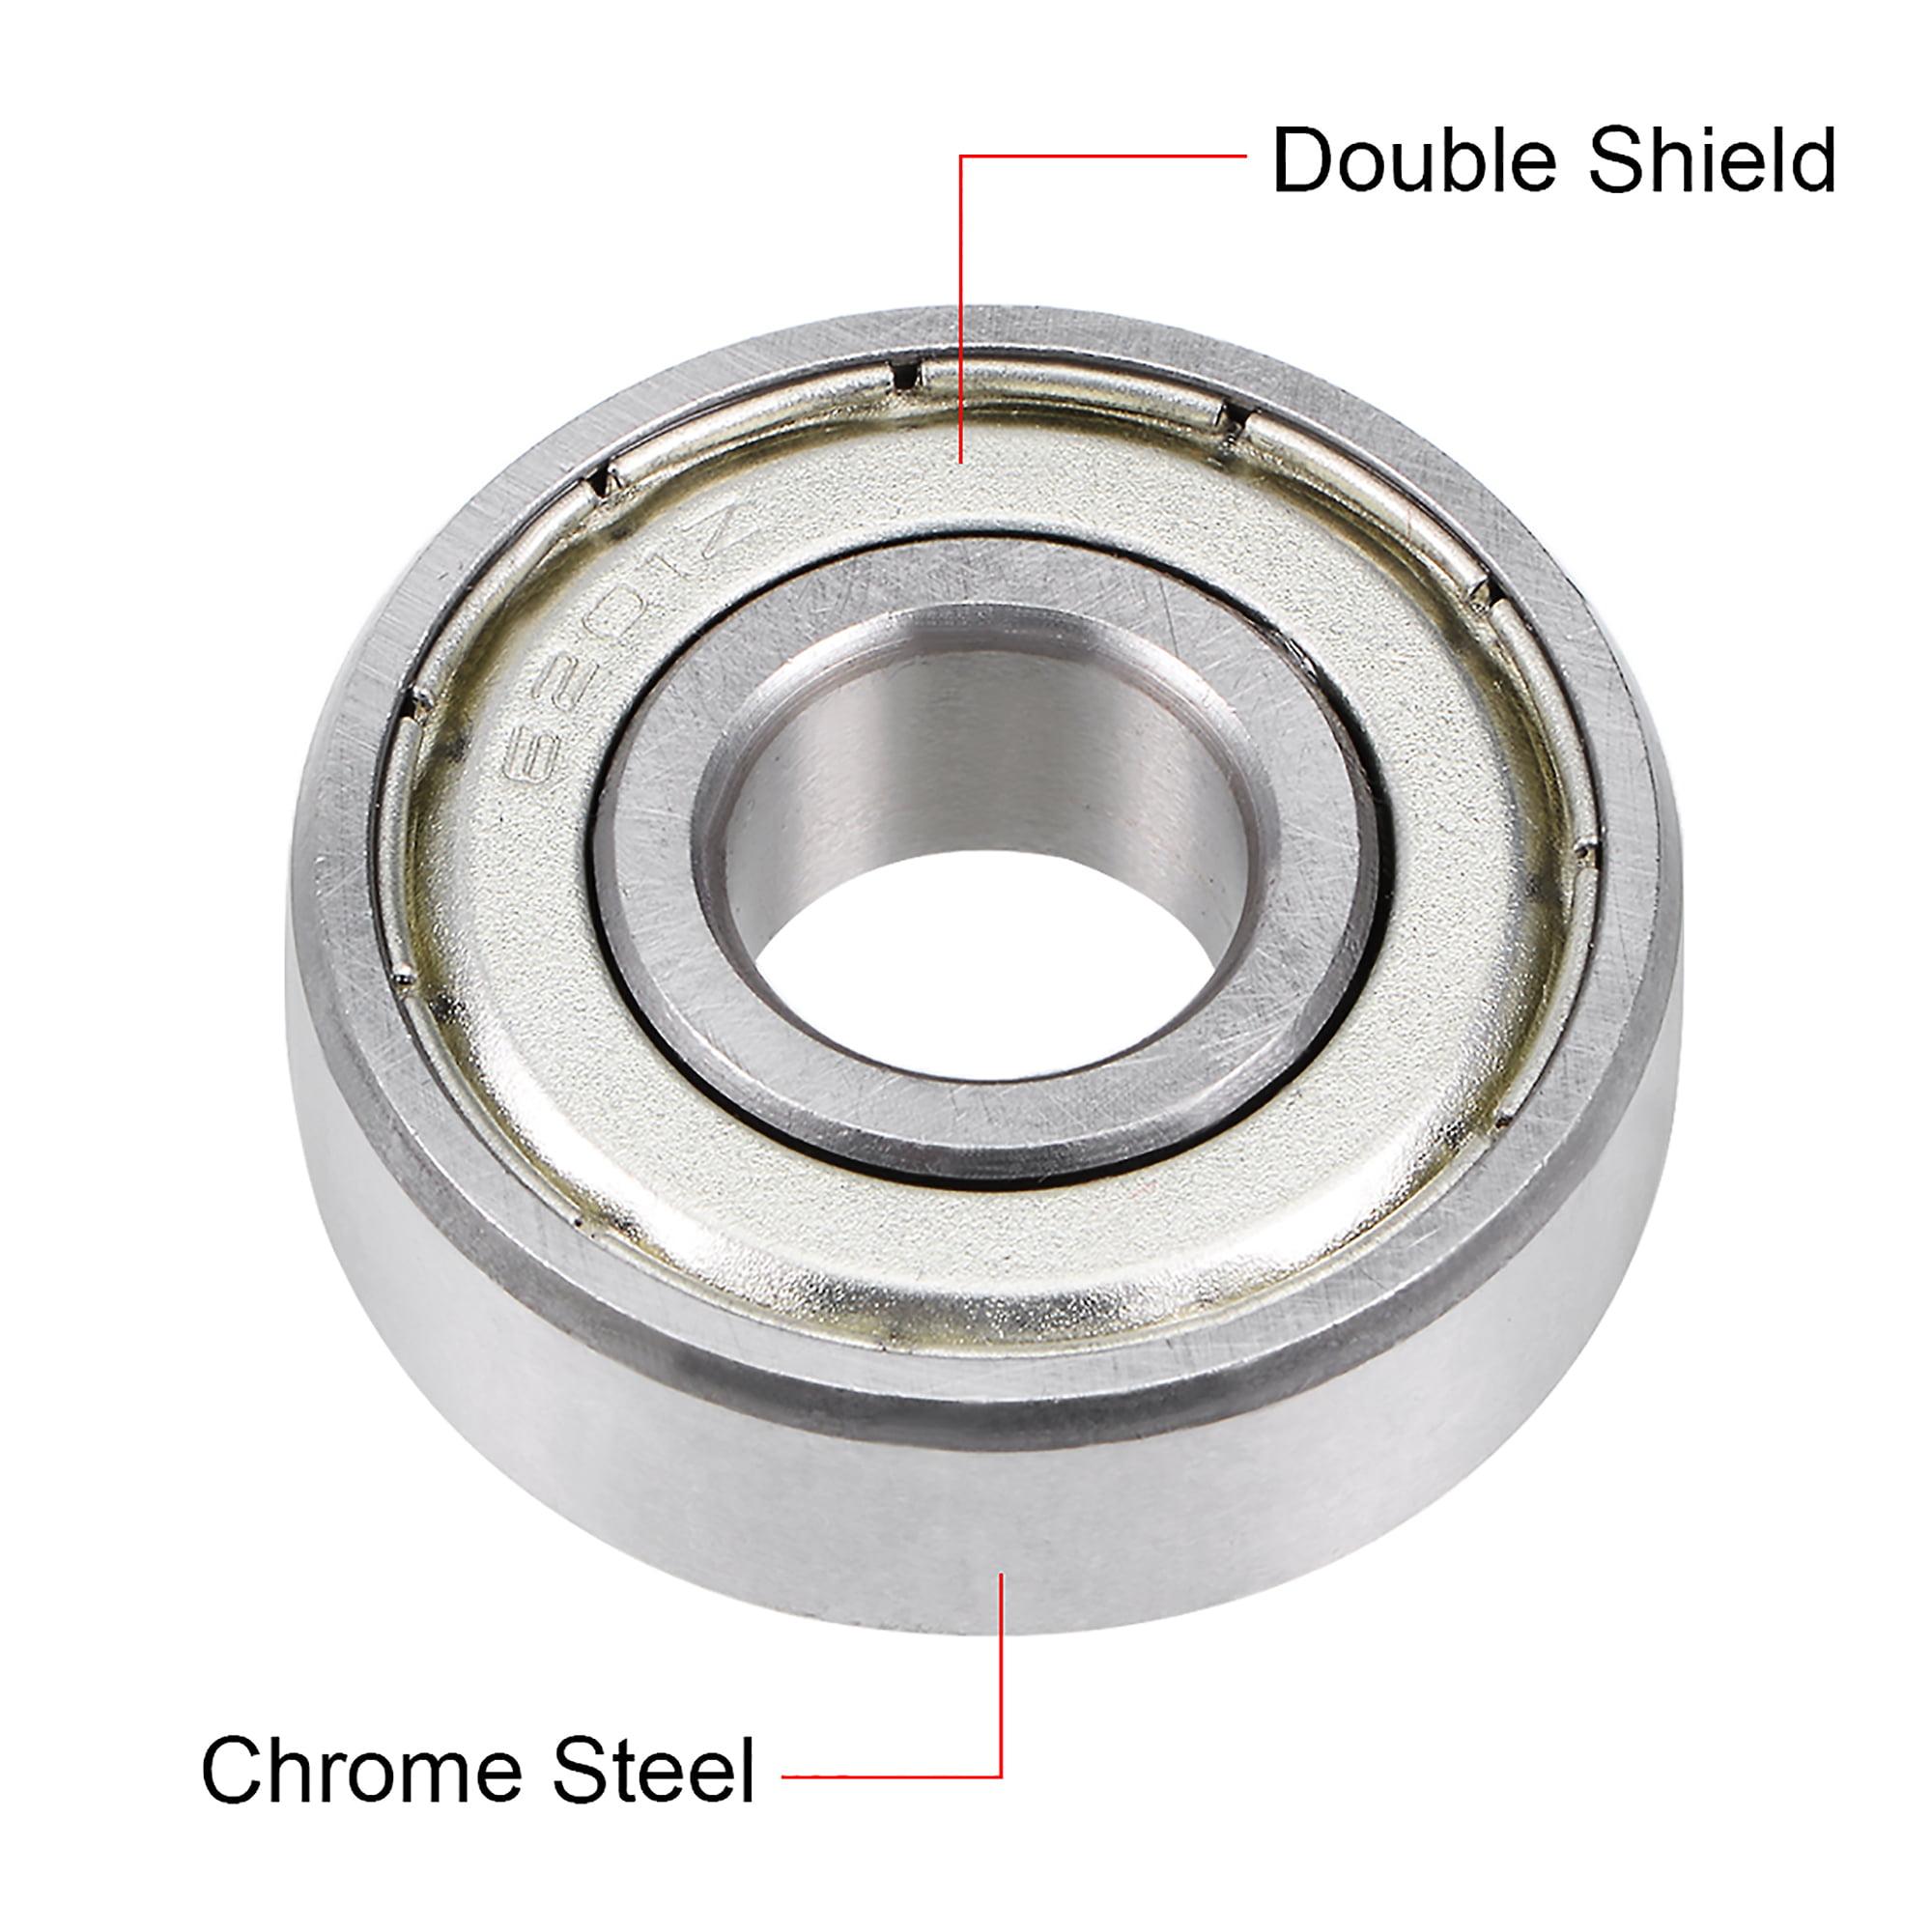 6201ZZ Deep Groove Ball Bearing 12x32x10mm Double Shielded Chrome Bearings 2Pcs - image 1 of 4